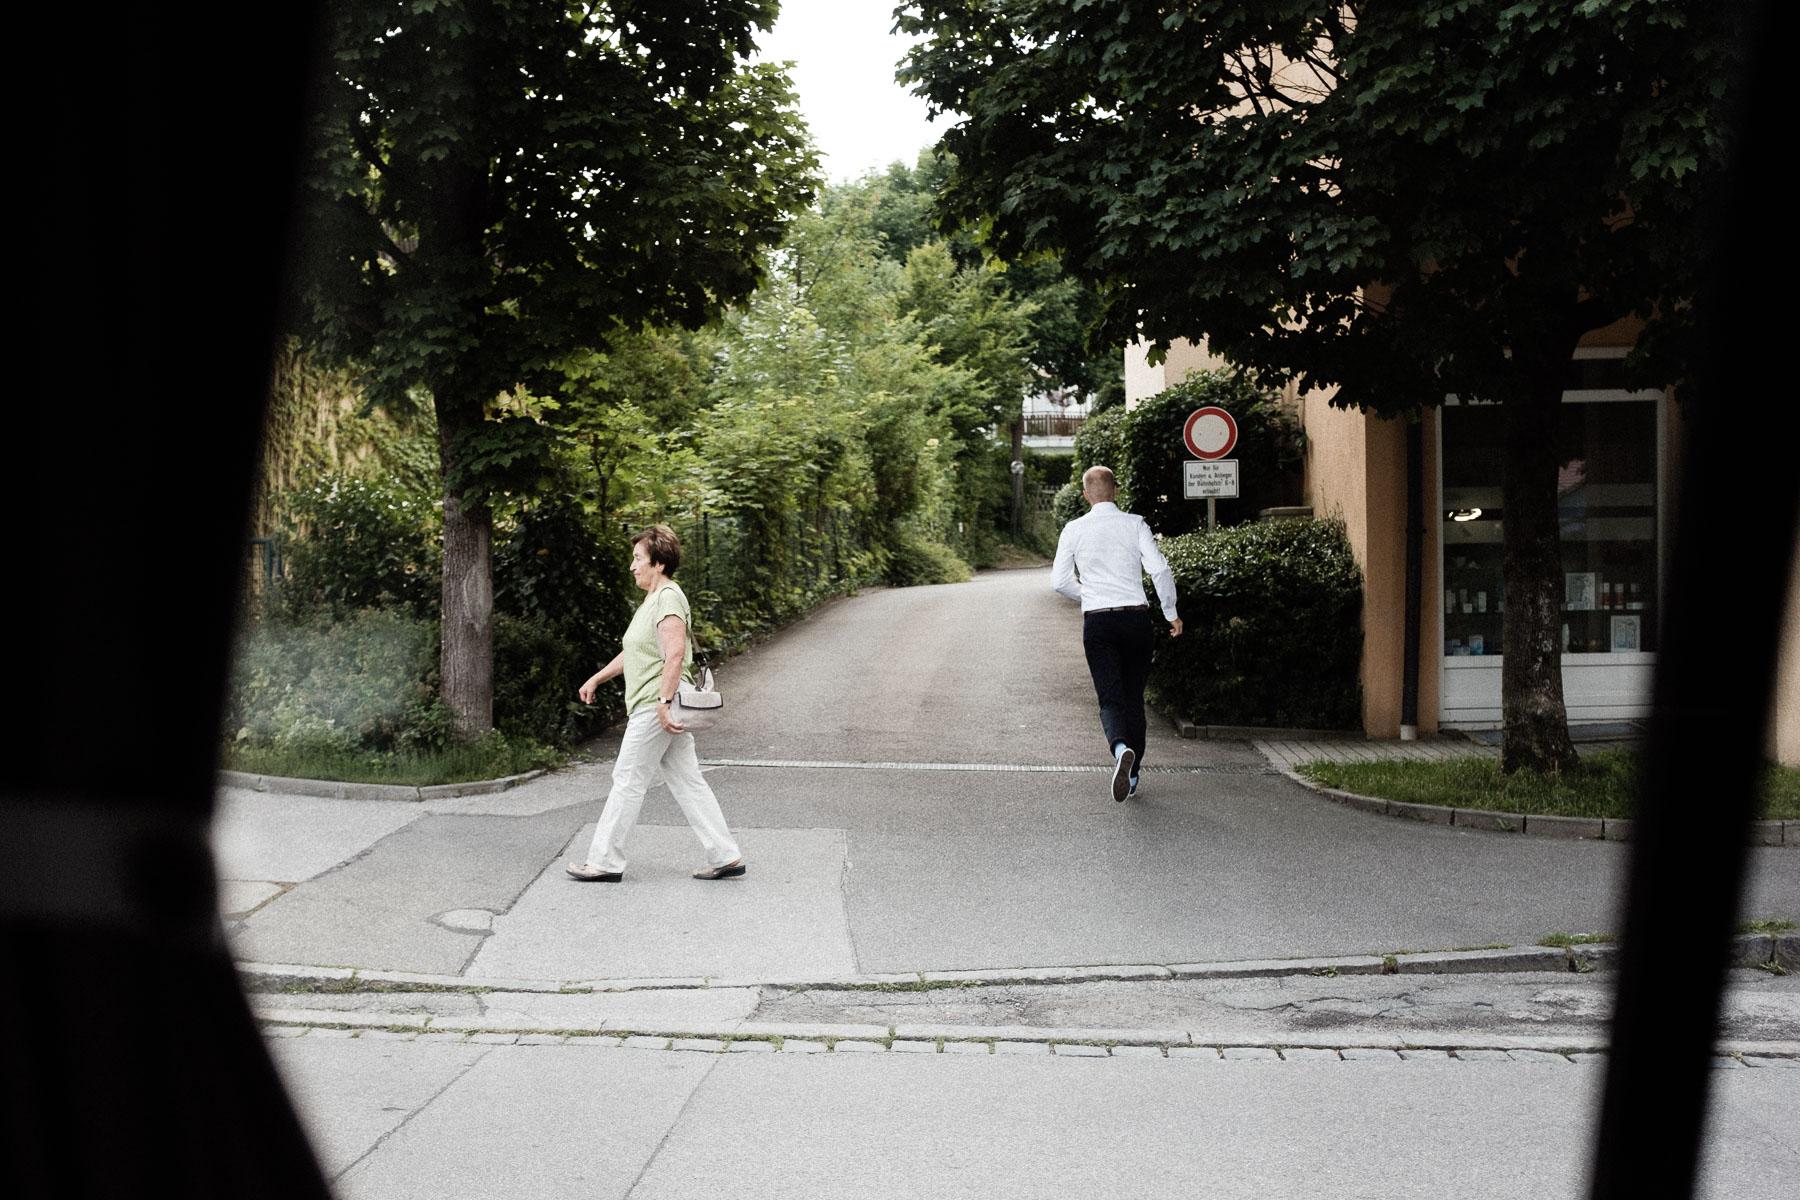 MartinLiebl_Hochzeitsfotograf_LCL_I_Blog_09.jpg